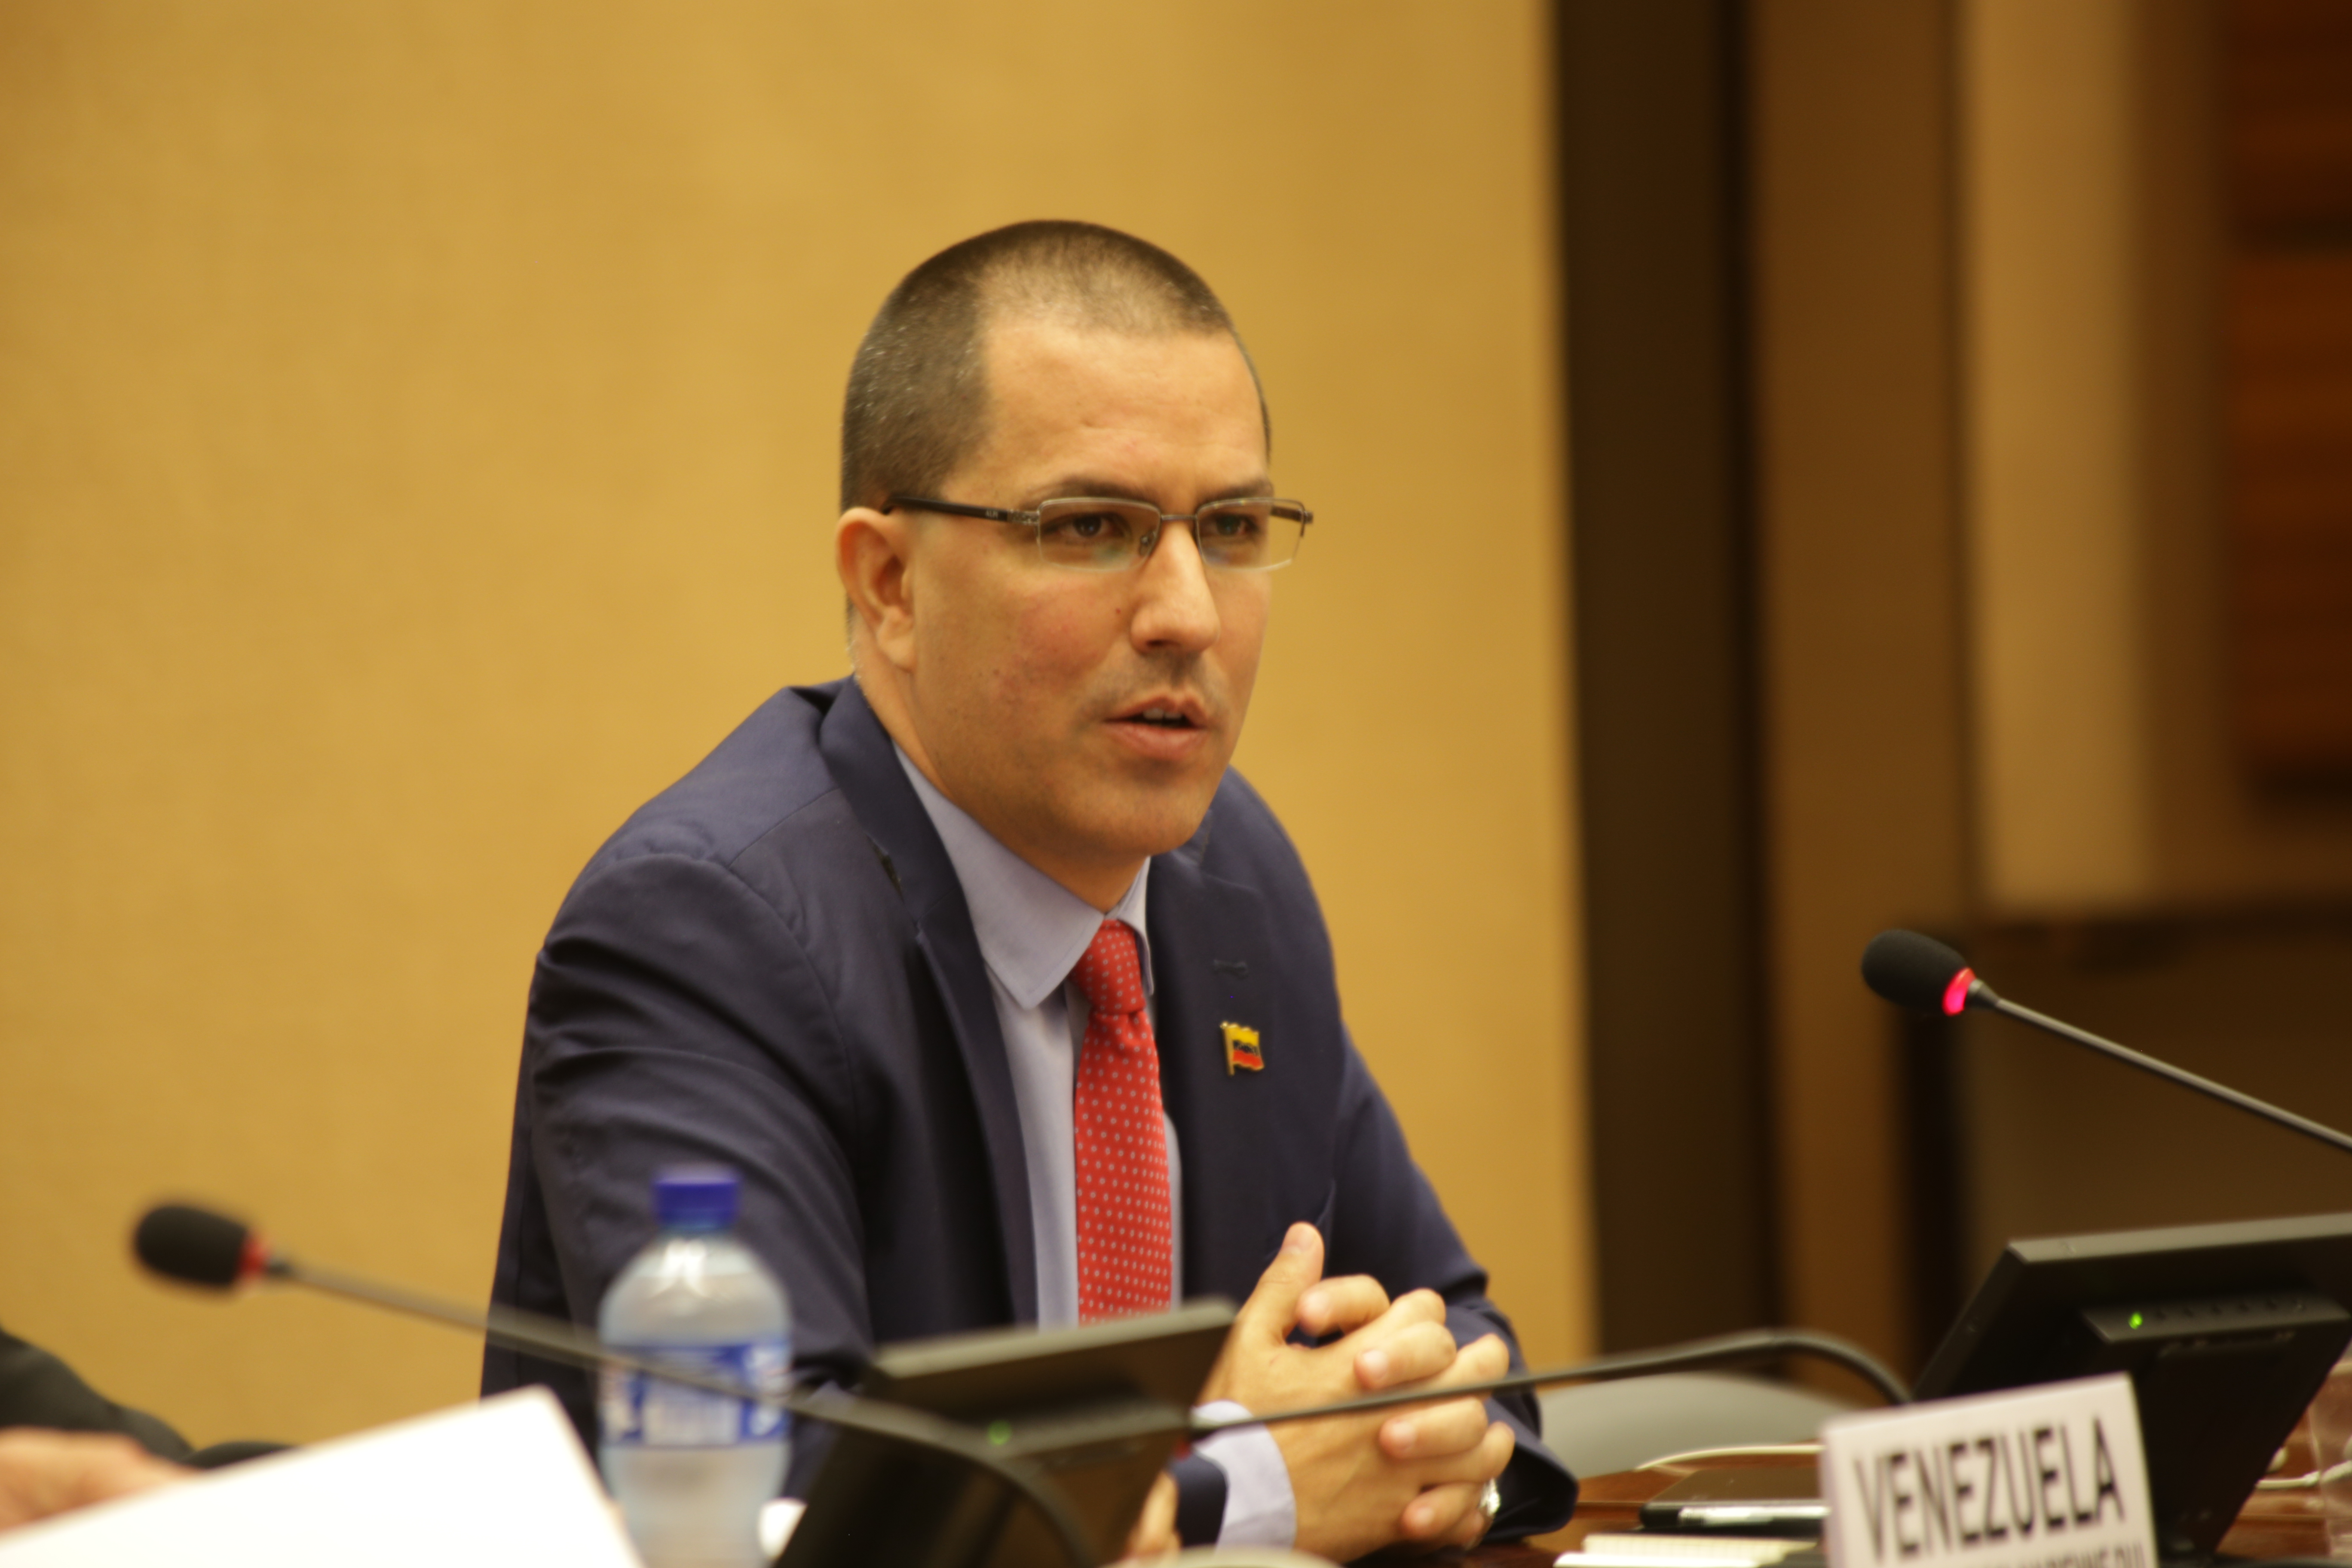 Canciller Arreaza participa desde la ONU-Ginebra en Foro sobre Medidas Coercitivas Unilaterales